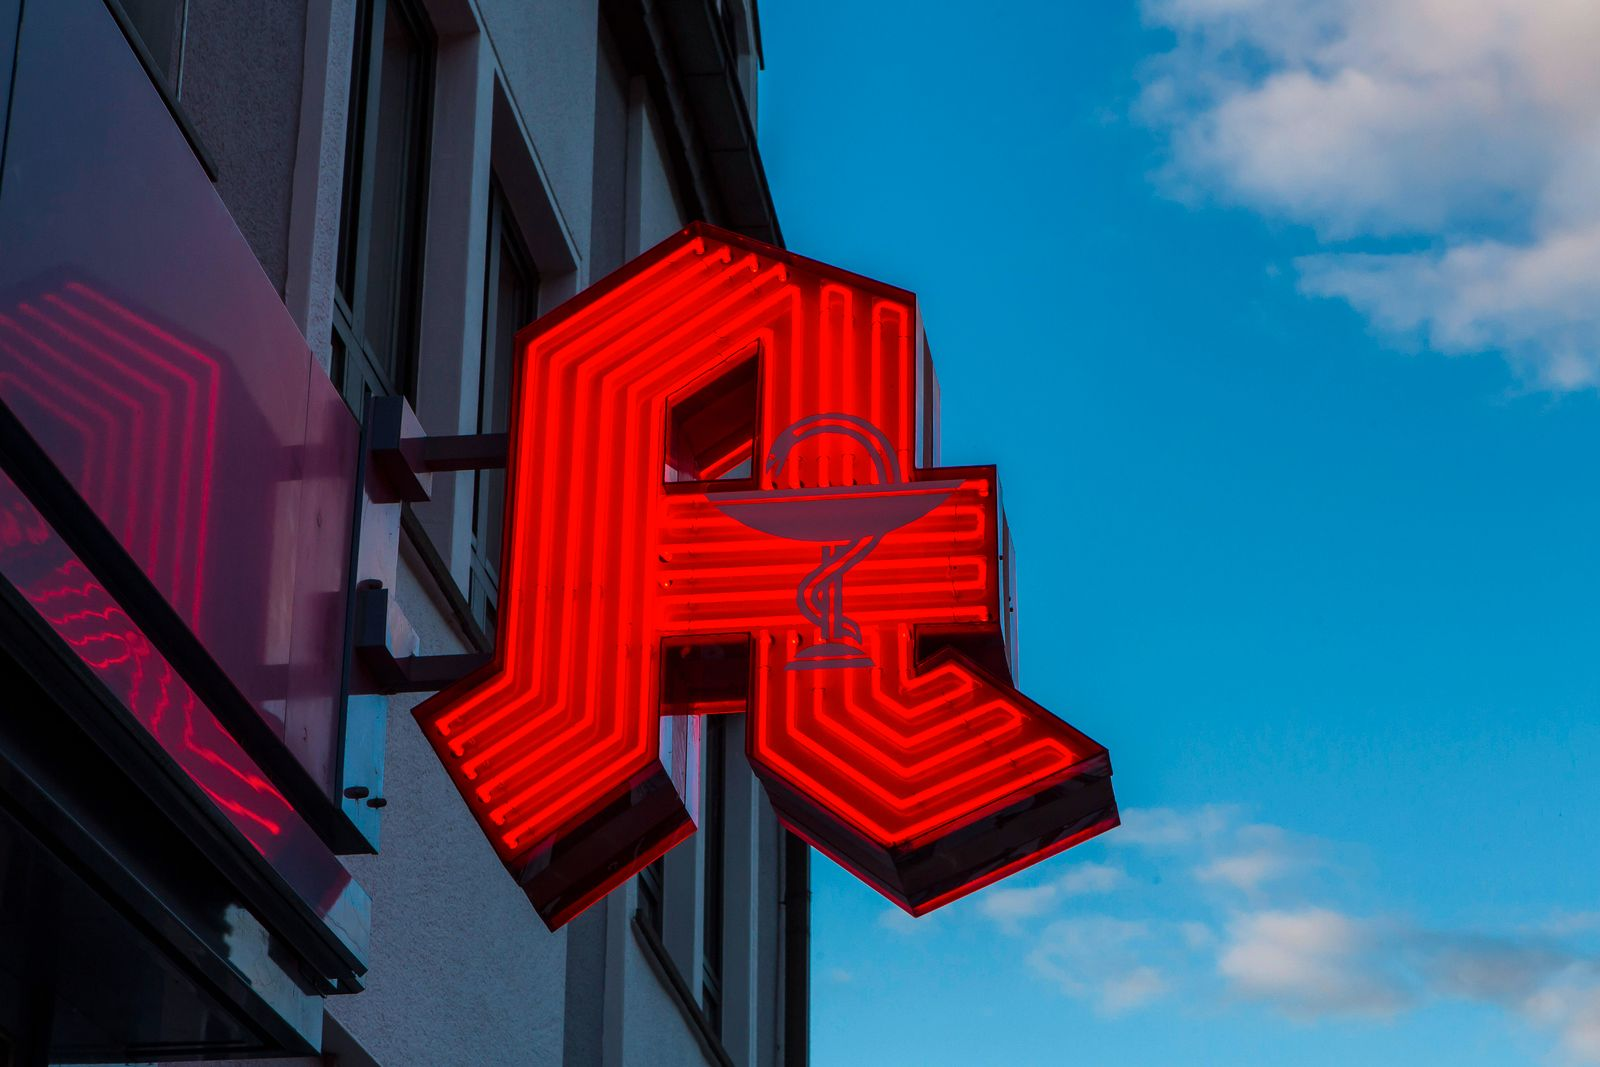 Logo einer Apotheke in Bad Münstereifel ( NRW ). Apotheke *** Logo of a pharmacy in Bad Münstereifel NRW Pharmacy